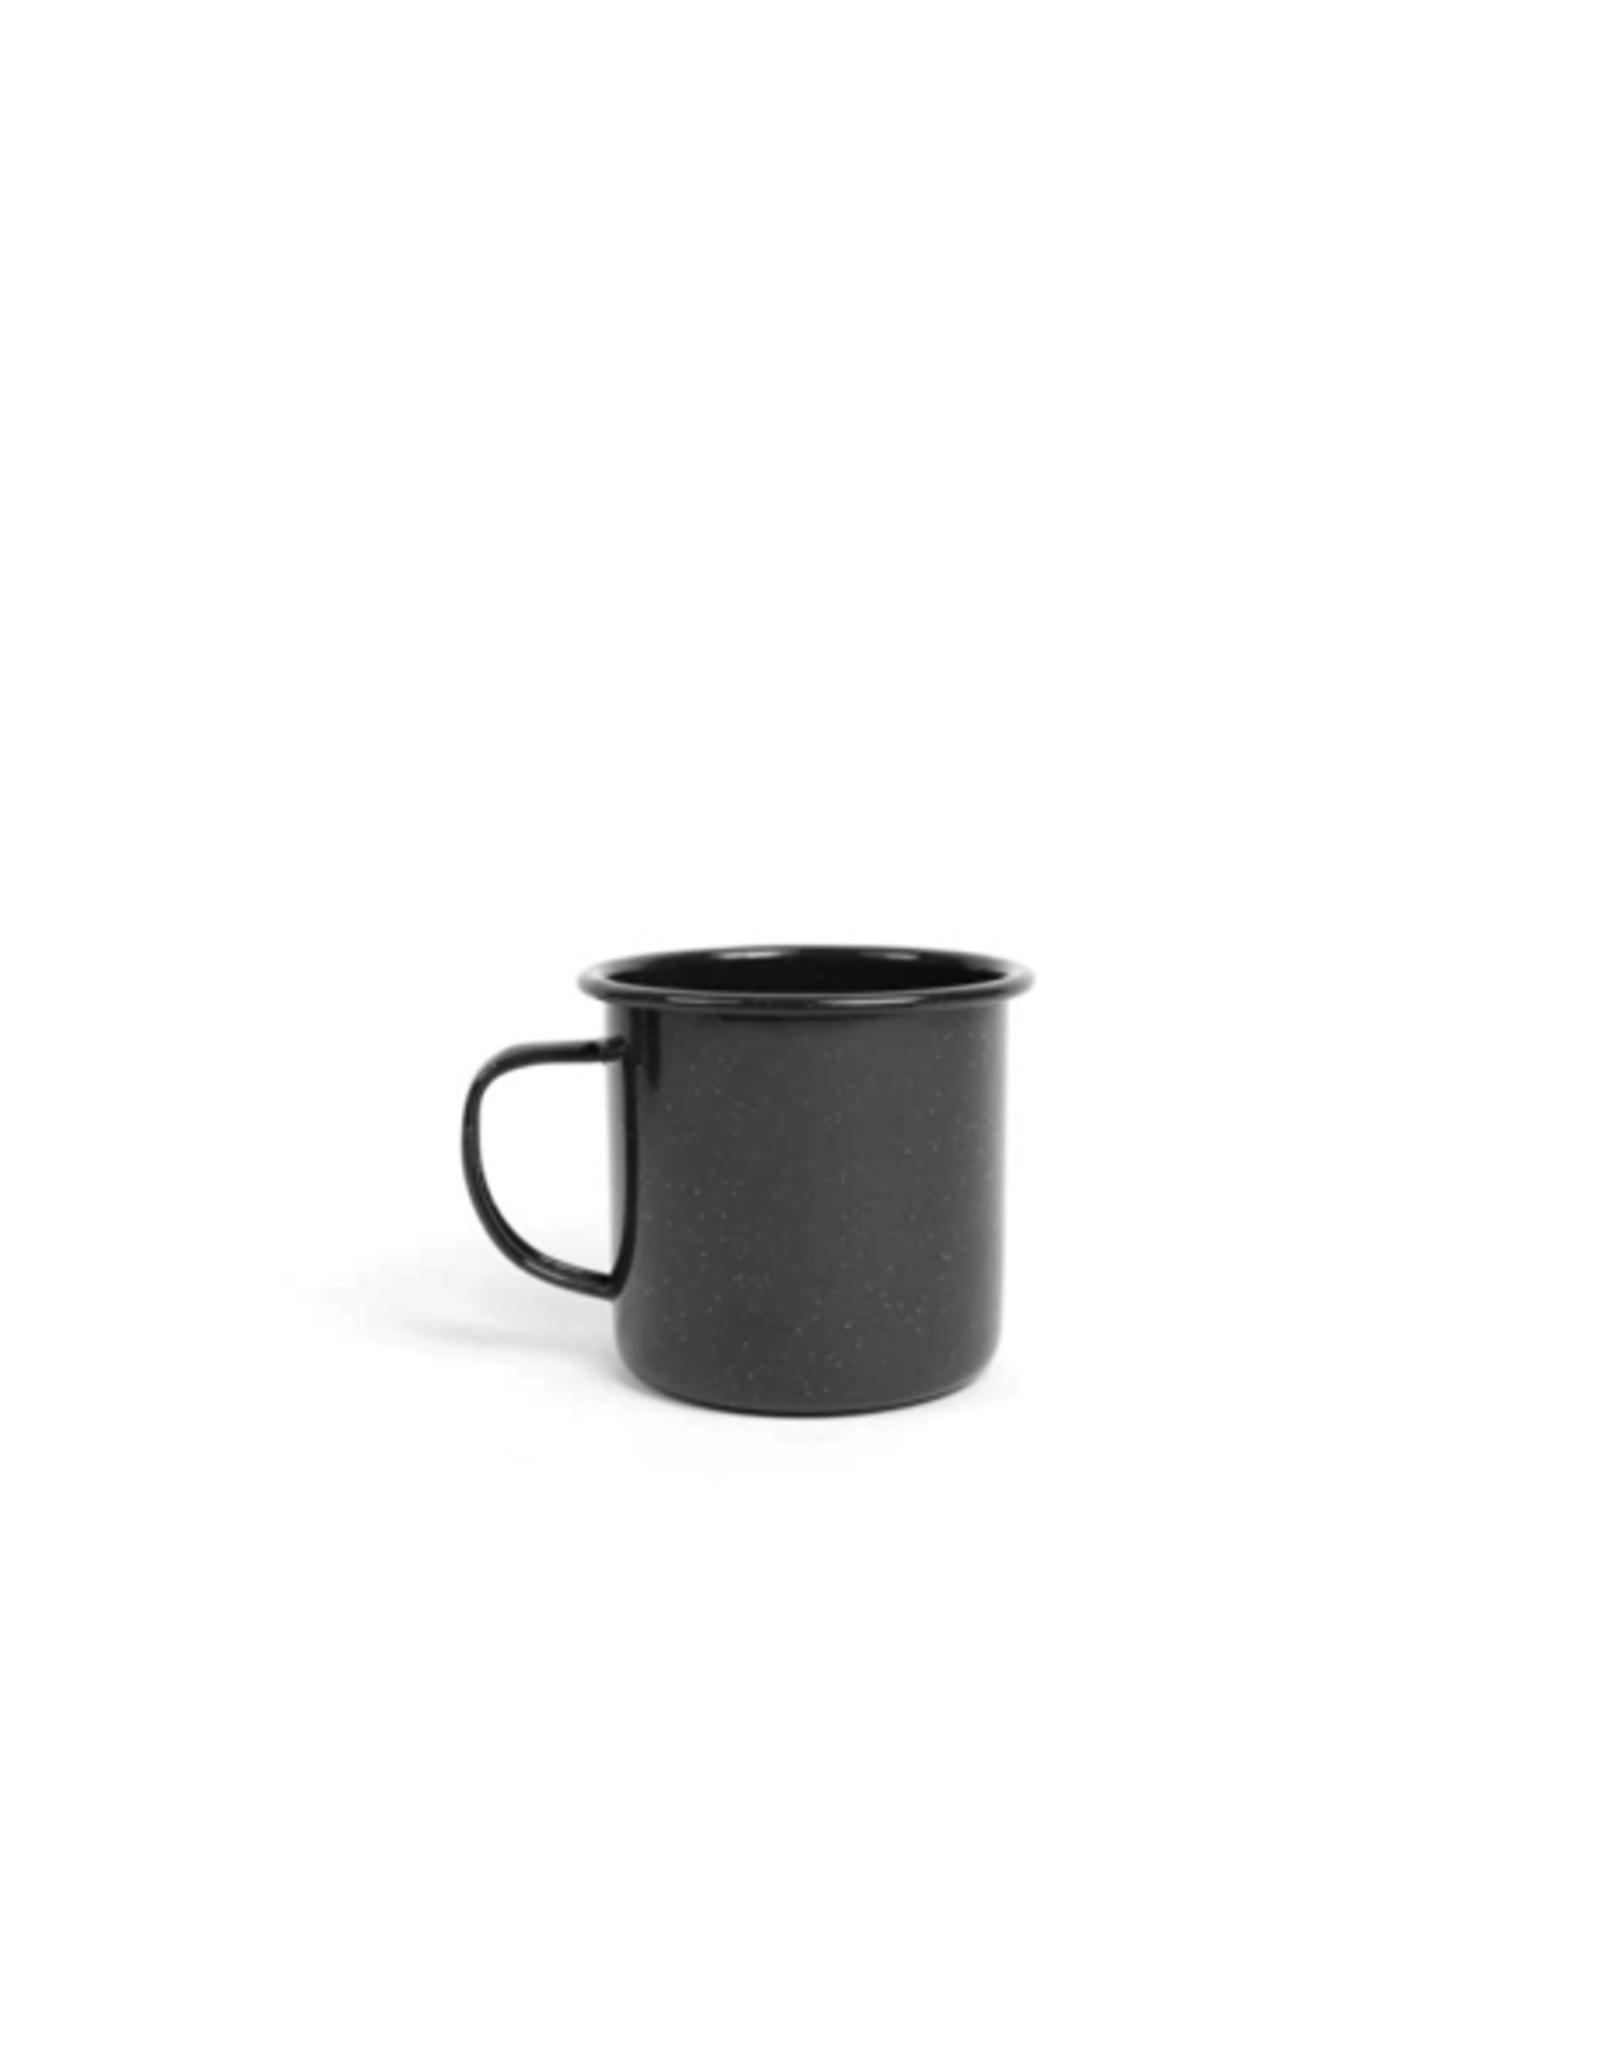 CON - Enamel Mug/Black, Speckled, 12oz